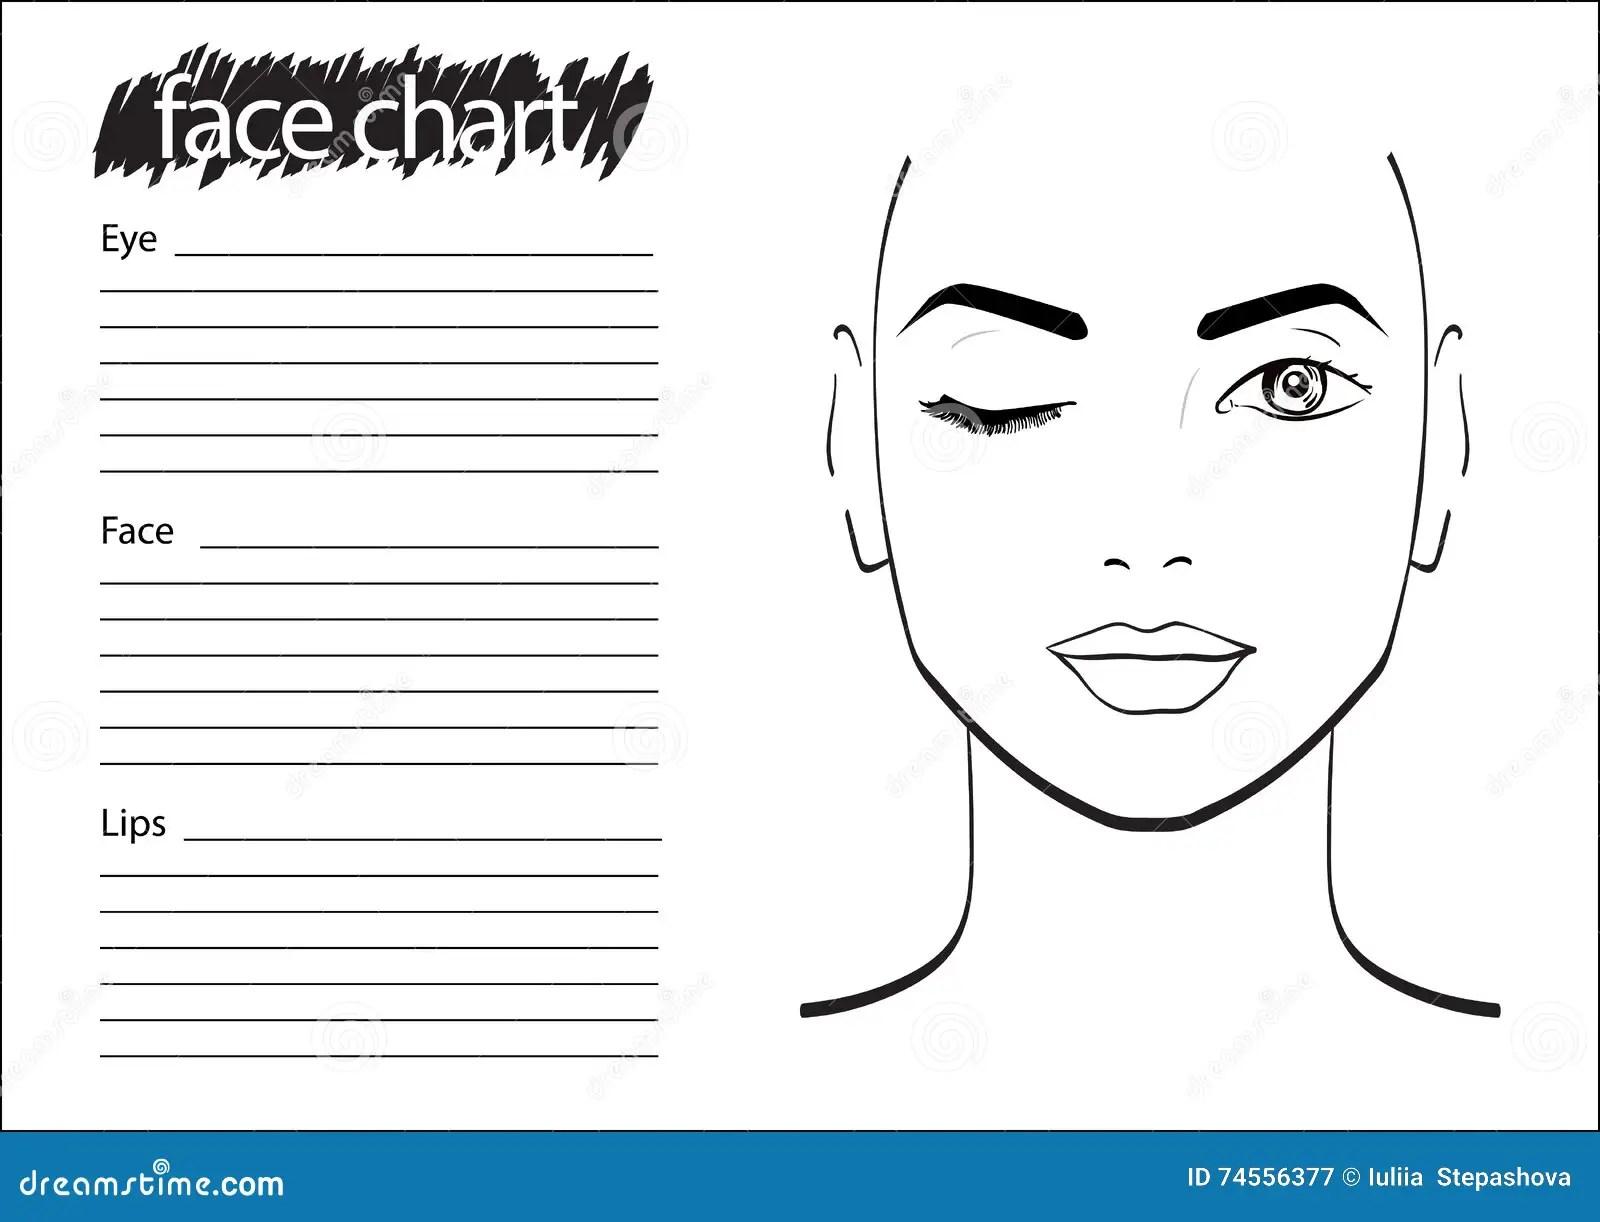 Face Chart Makeup Artist Blank Stock Illustration